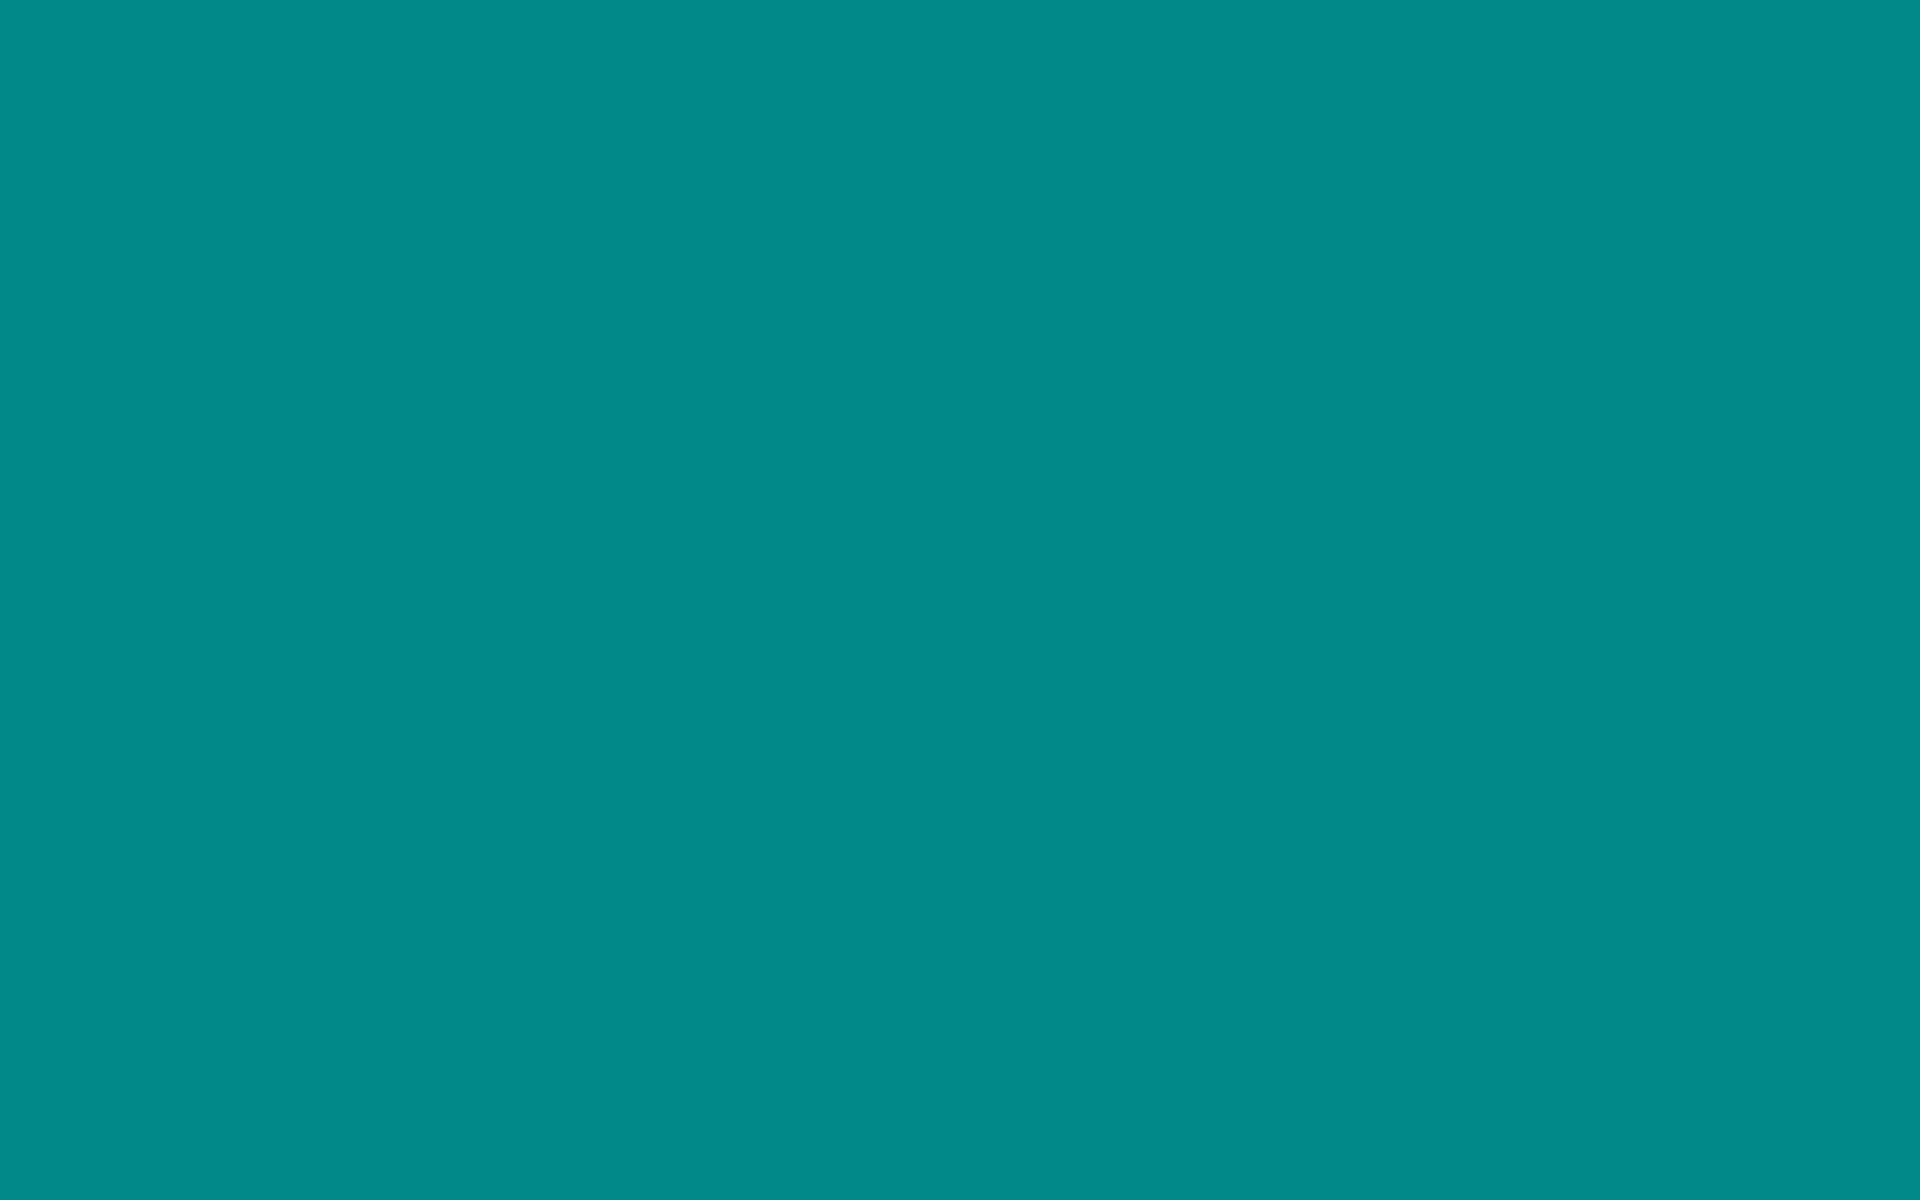 1920x1200 Dark Cyan Solid Color Background